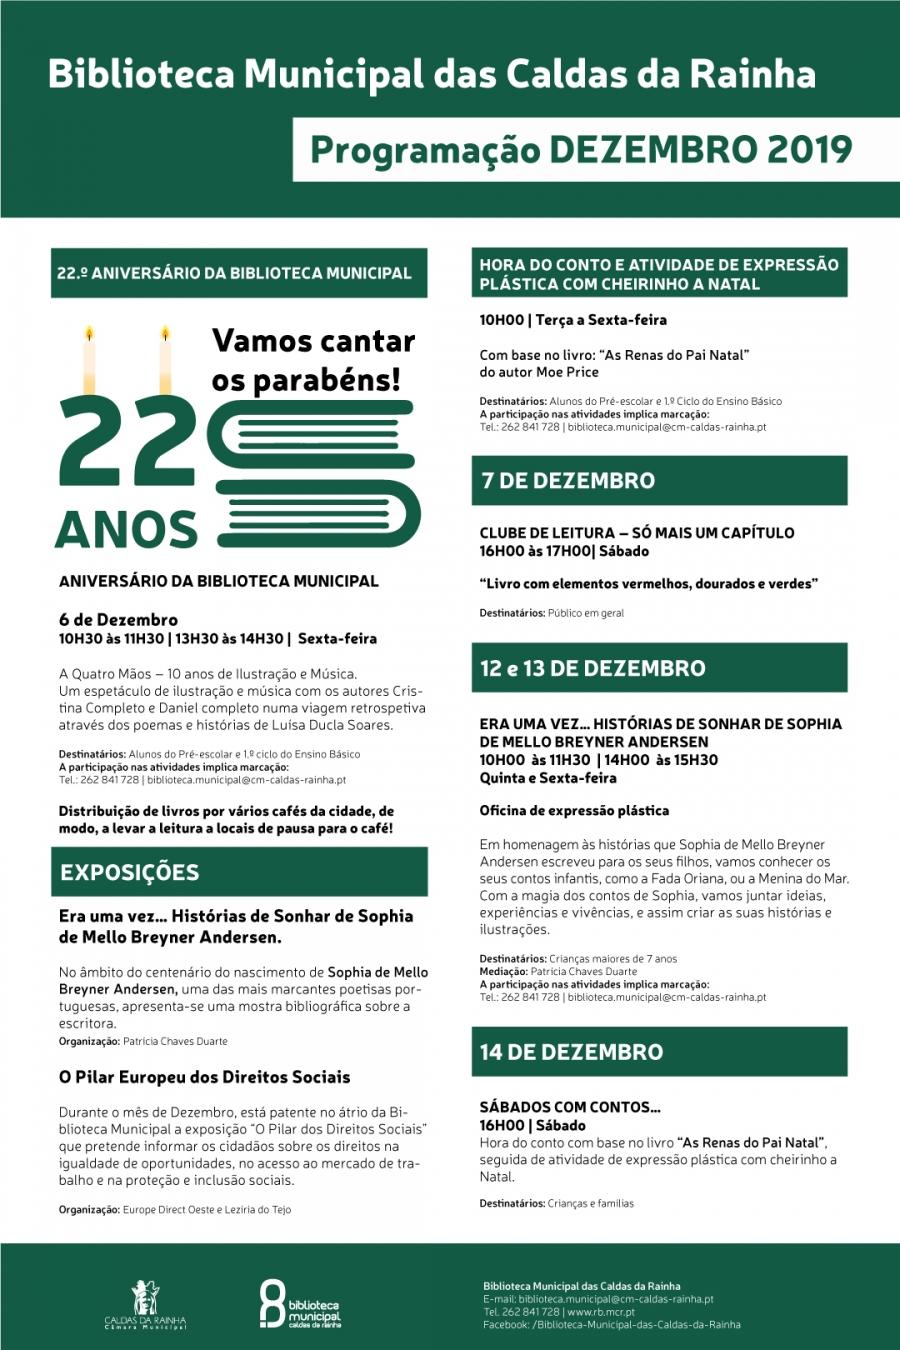 22.º ANIVERSÁRIO DA BIBLIOTECA MUNICIPAL